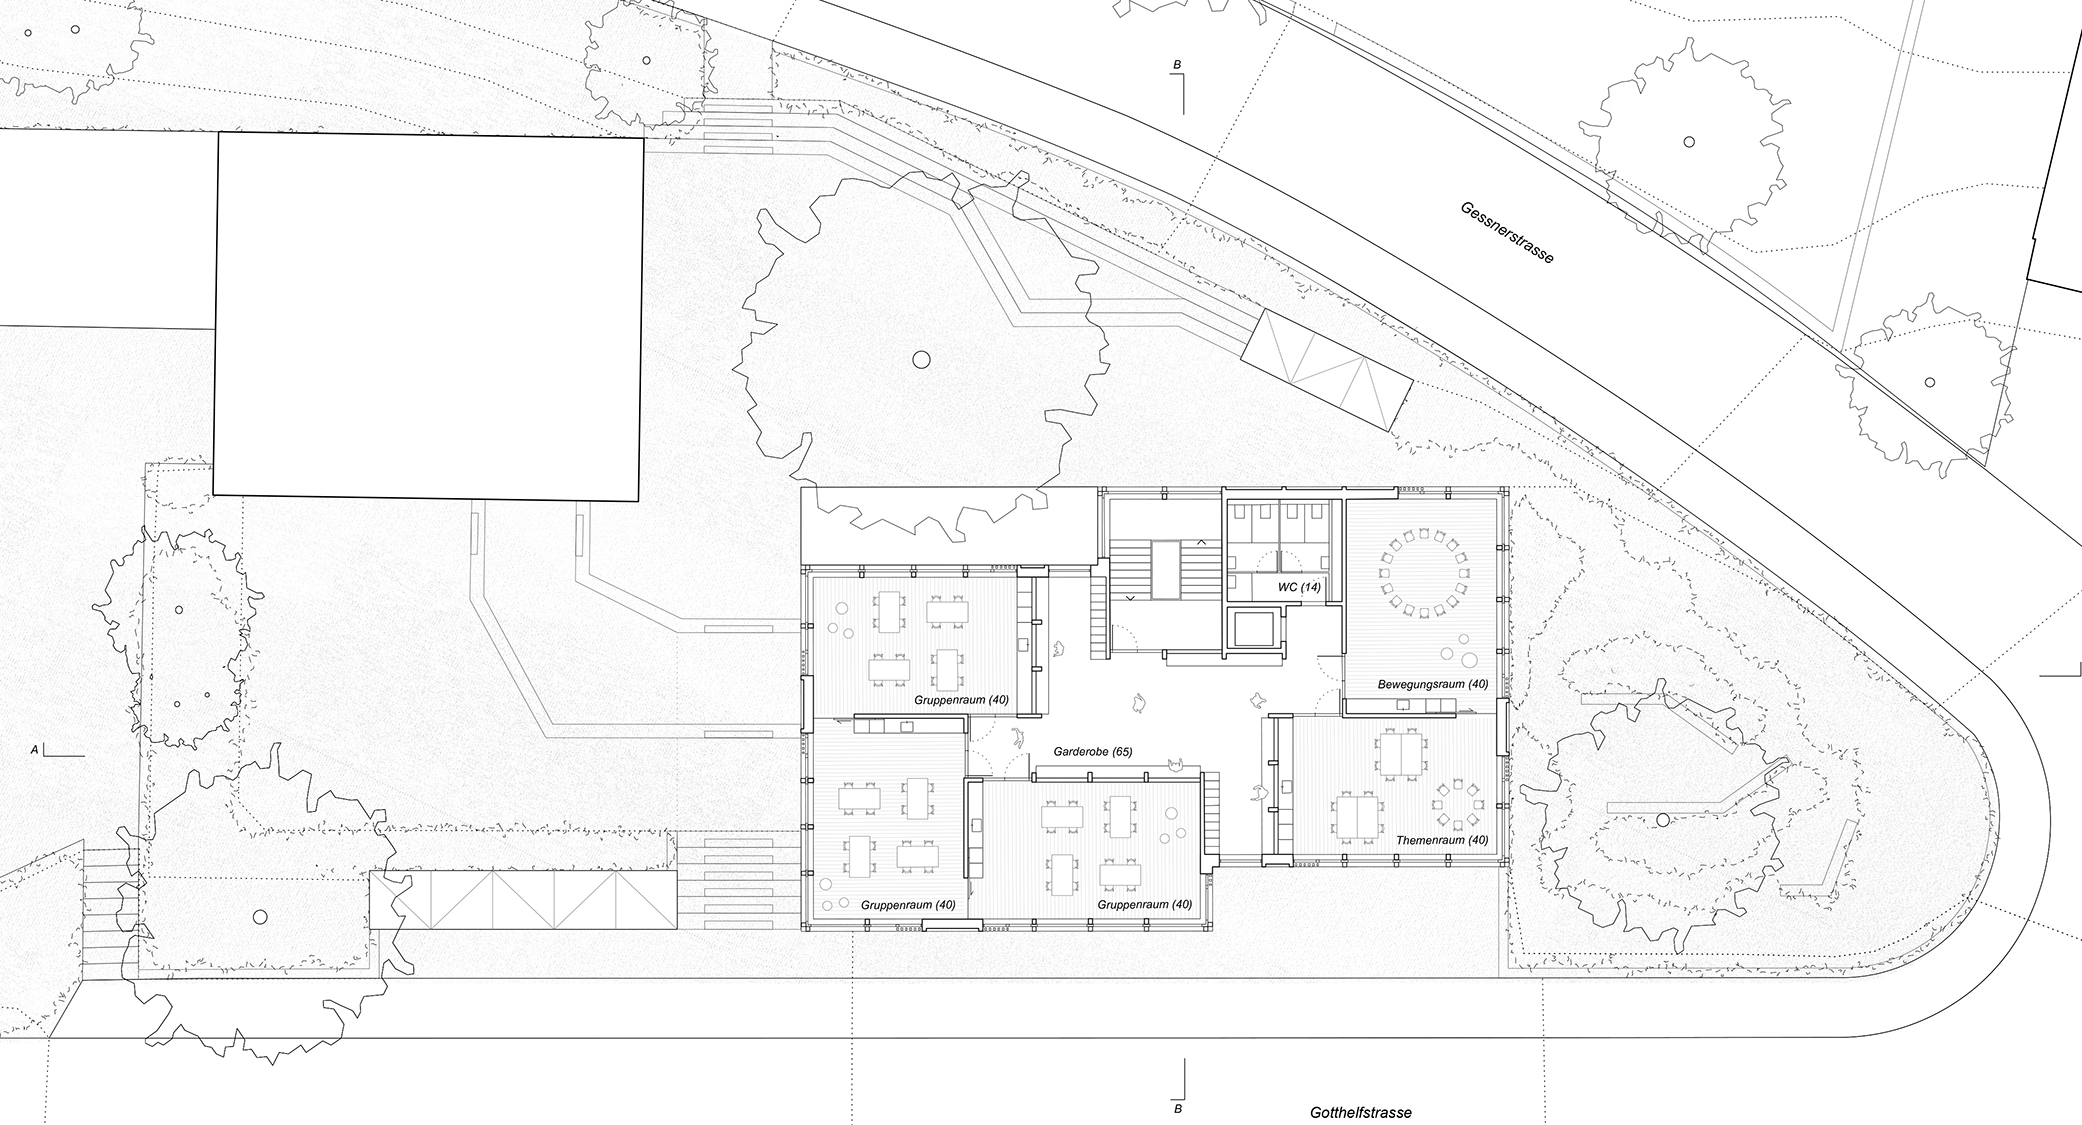 Pfister Klingenfuss Architekten AG, Wettbewerb, Tagesbetreuung Hebel, Regelgeschoss